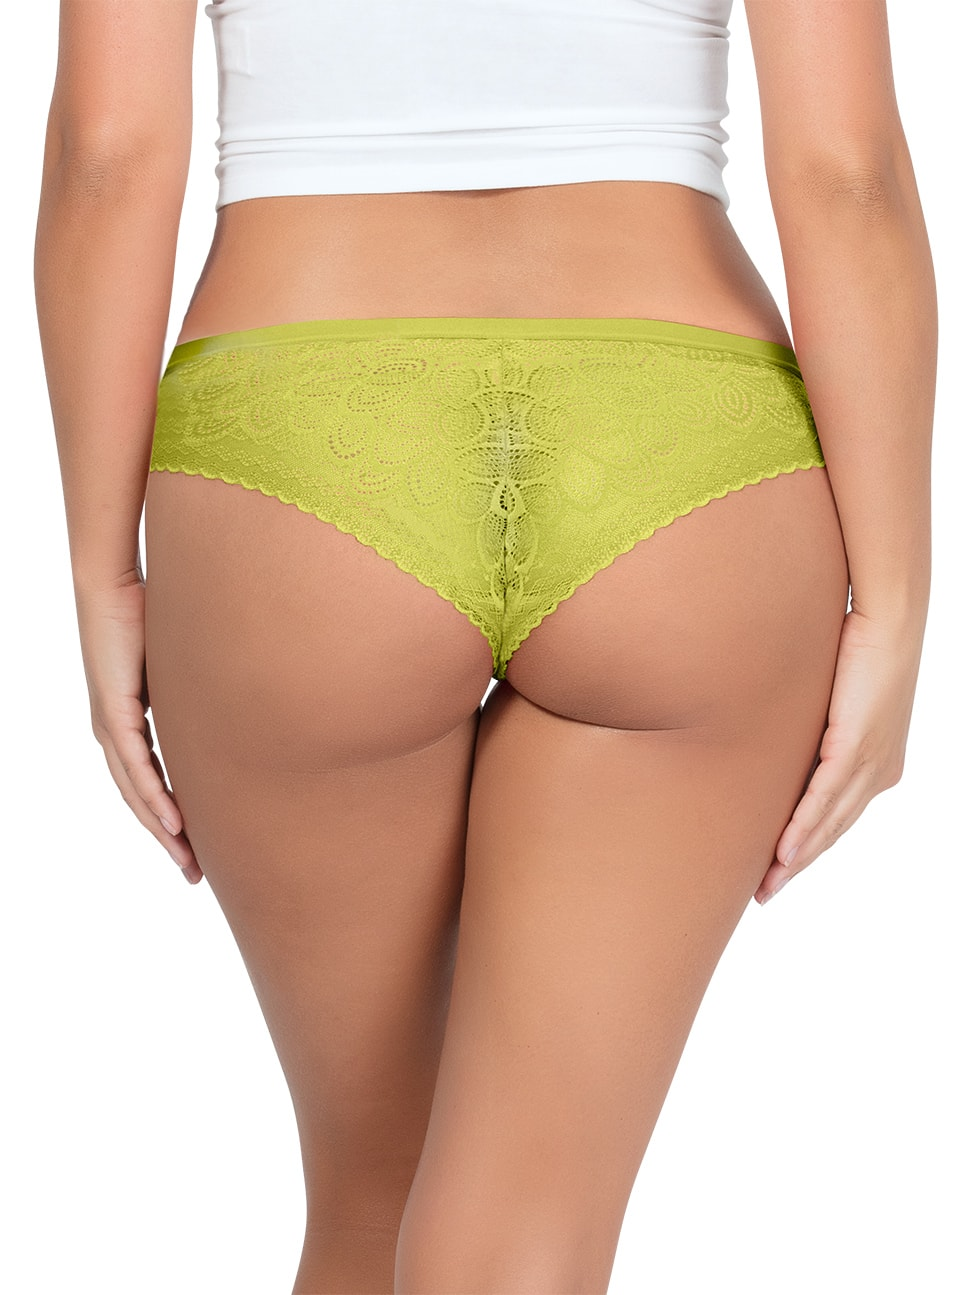 PARFAIT ParfaitPanty SoGlam BikiniPP302 Lemonade Back2 copy - Panty So Glam Bikini - Lemonade - PP302